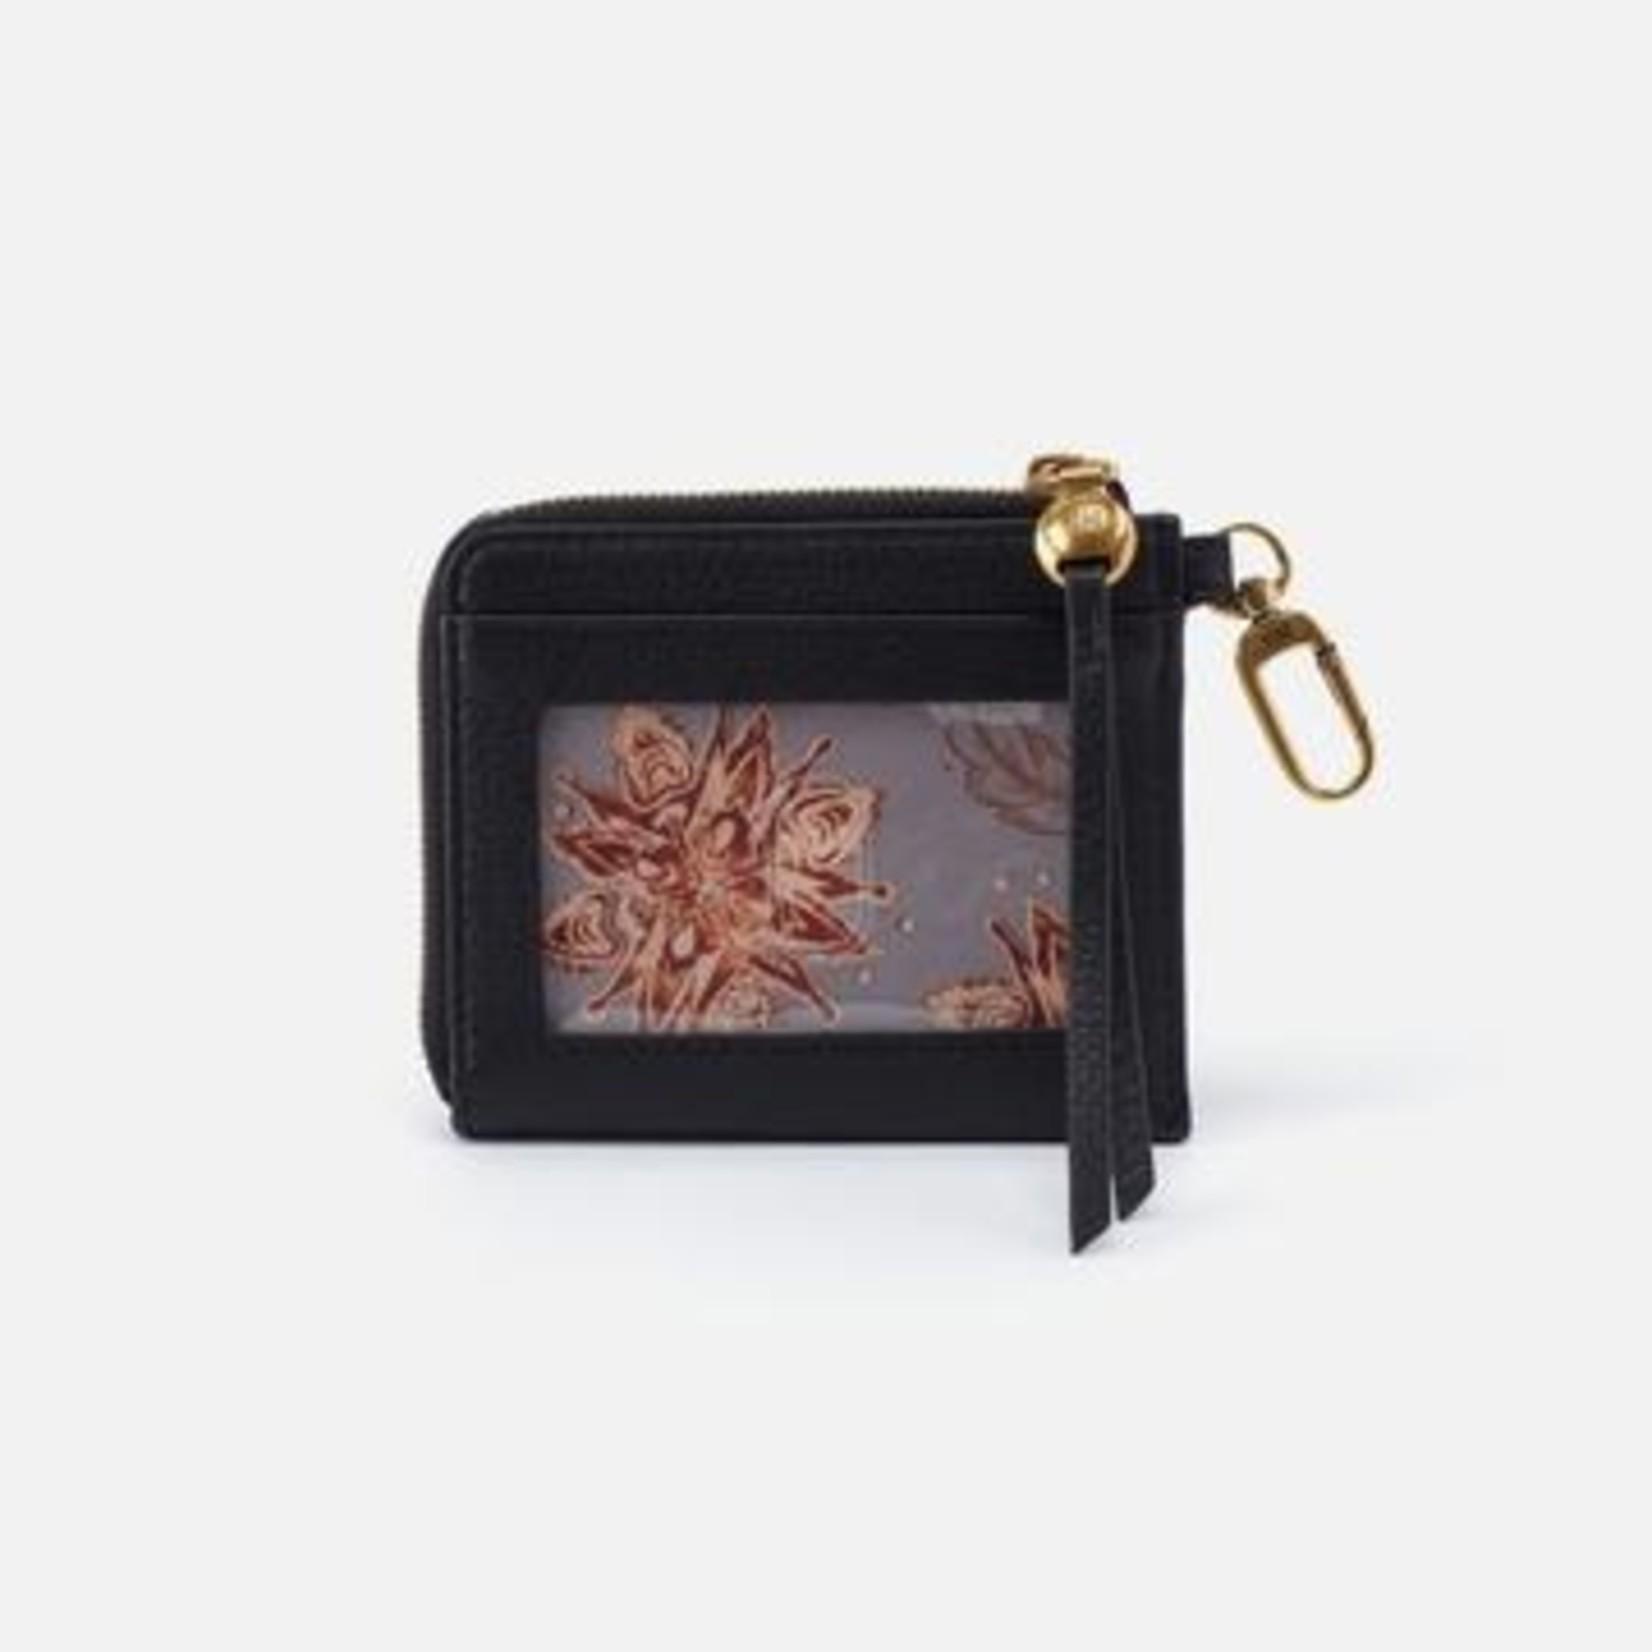 HOBO Bags Flip Go Clip Wallet Black